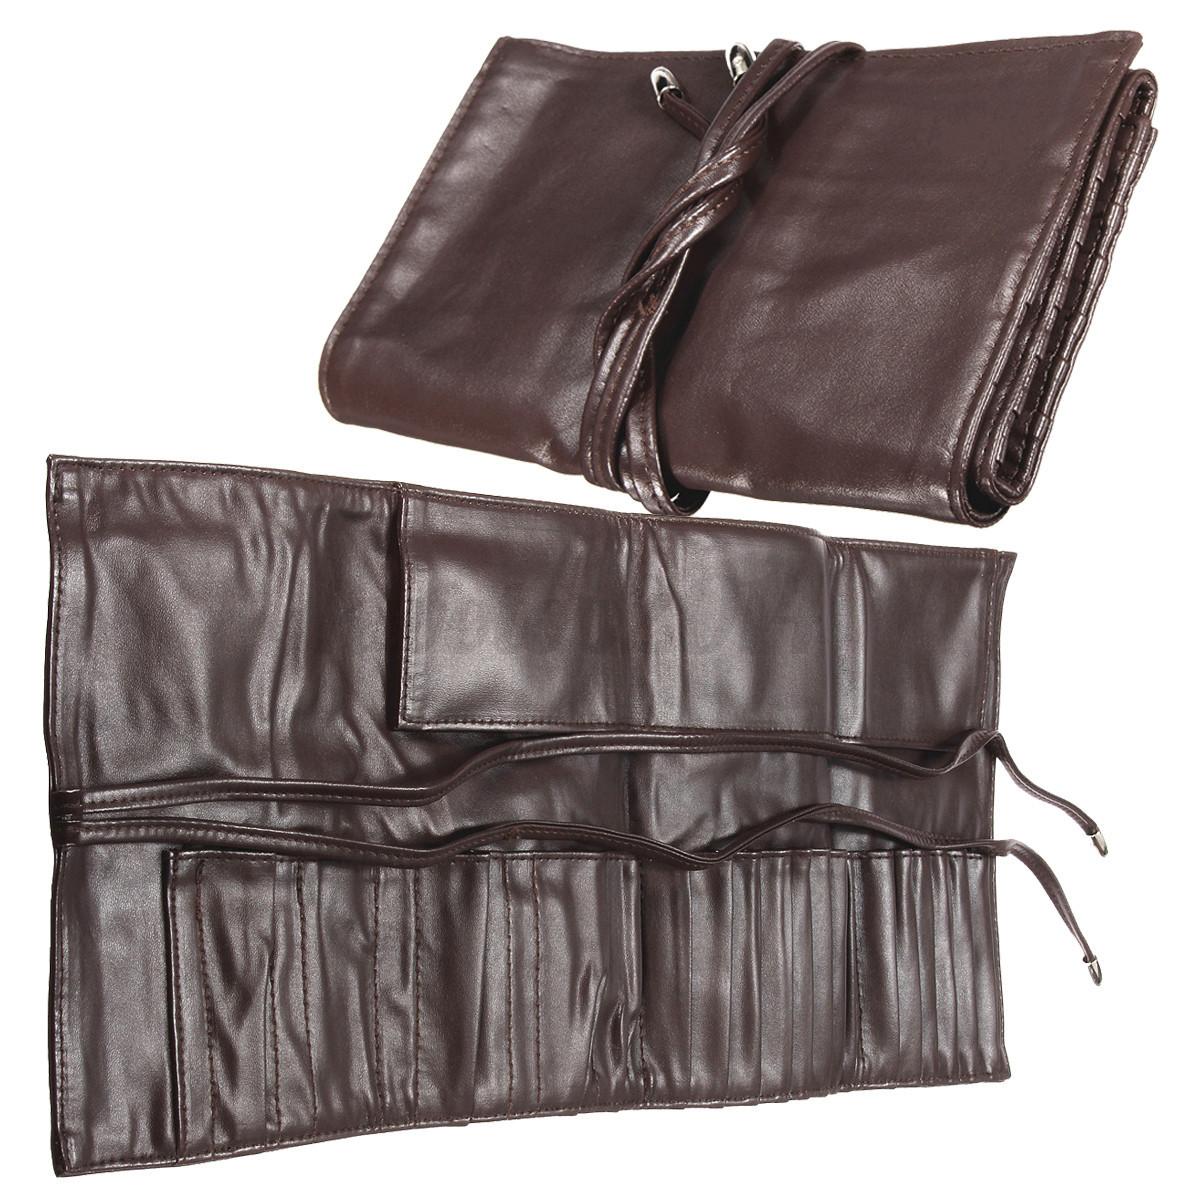 Leatherworking bag 32 slot tommy bahama poker chip set